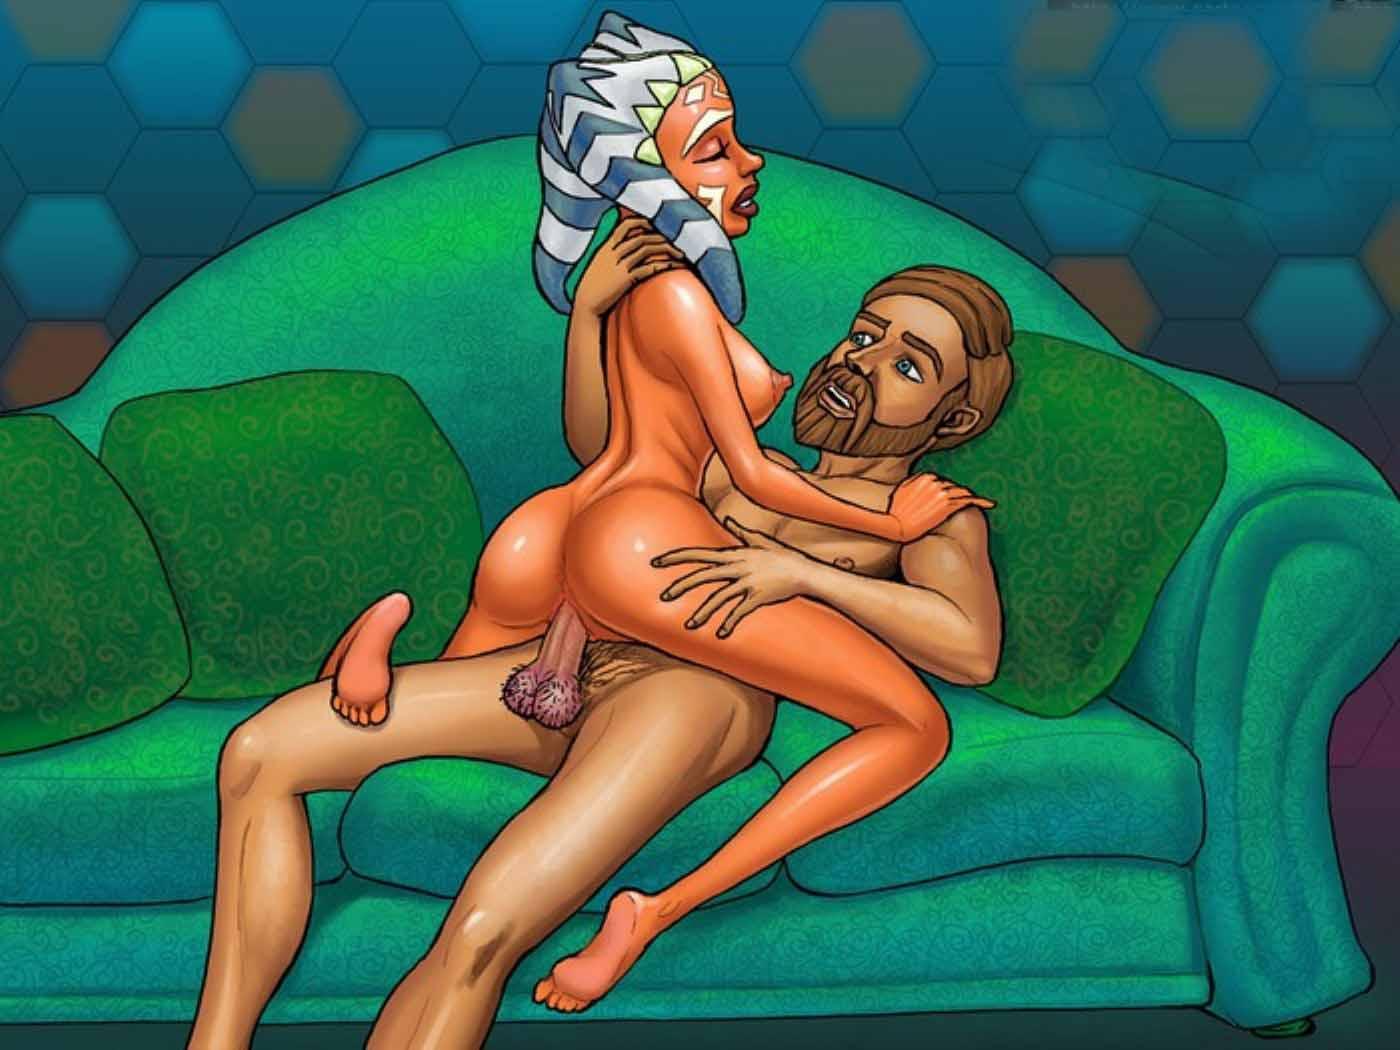 porn toons war Tags: erotic sex games, padme amidala sucking cock, star wars porn  game.